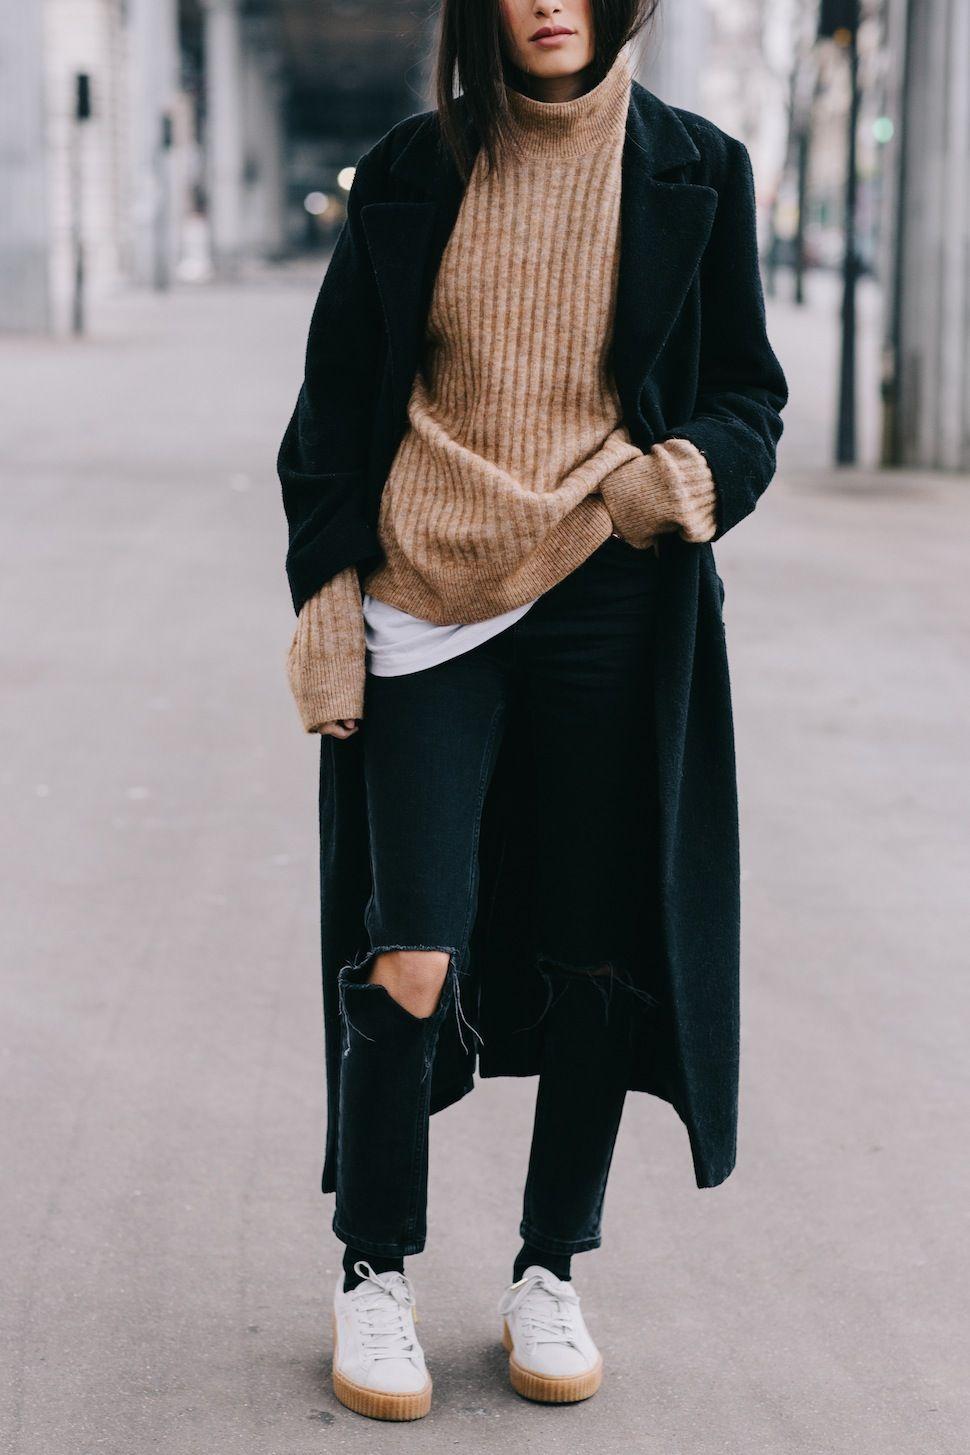 pin by lena ivanova on fashion in 2018 pinterest mode. Black Bedroom Furniture Sets. Home Design Ideas